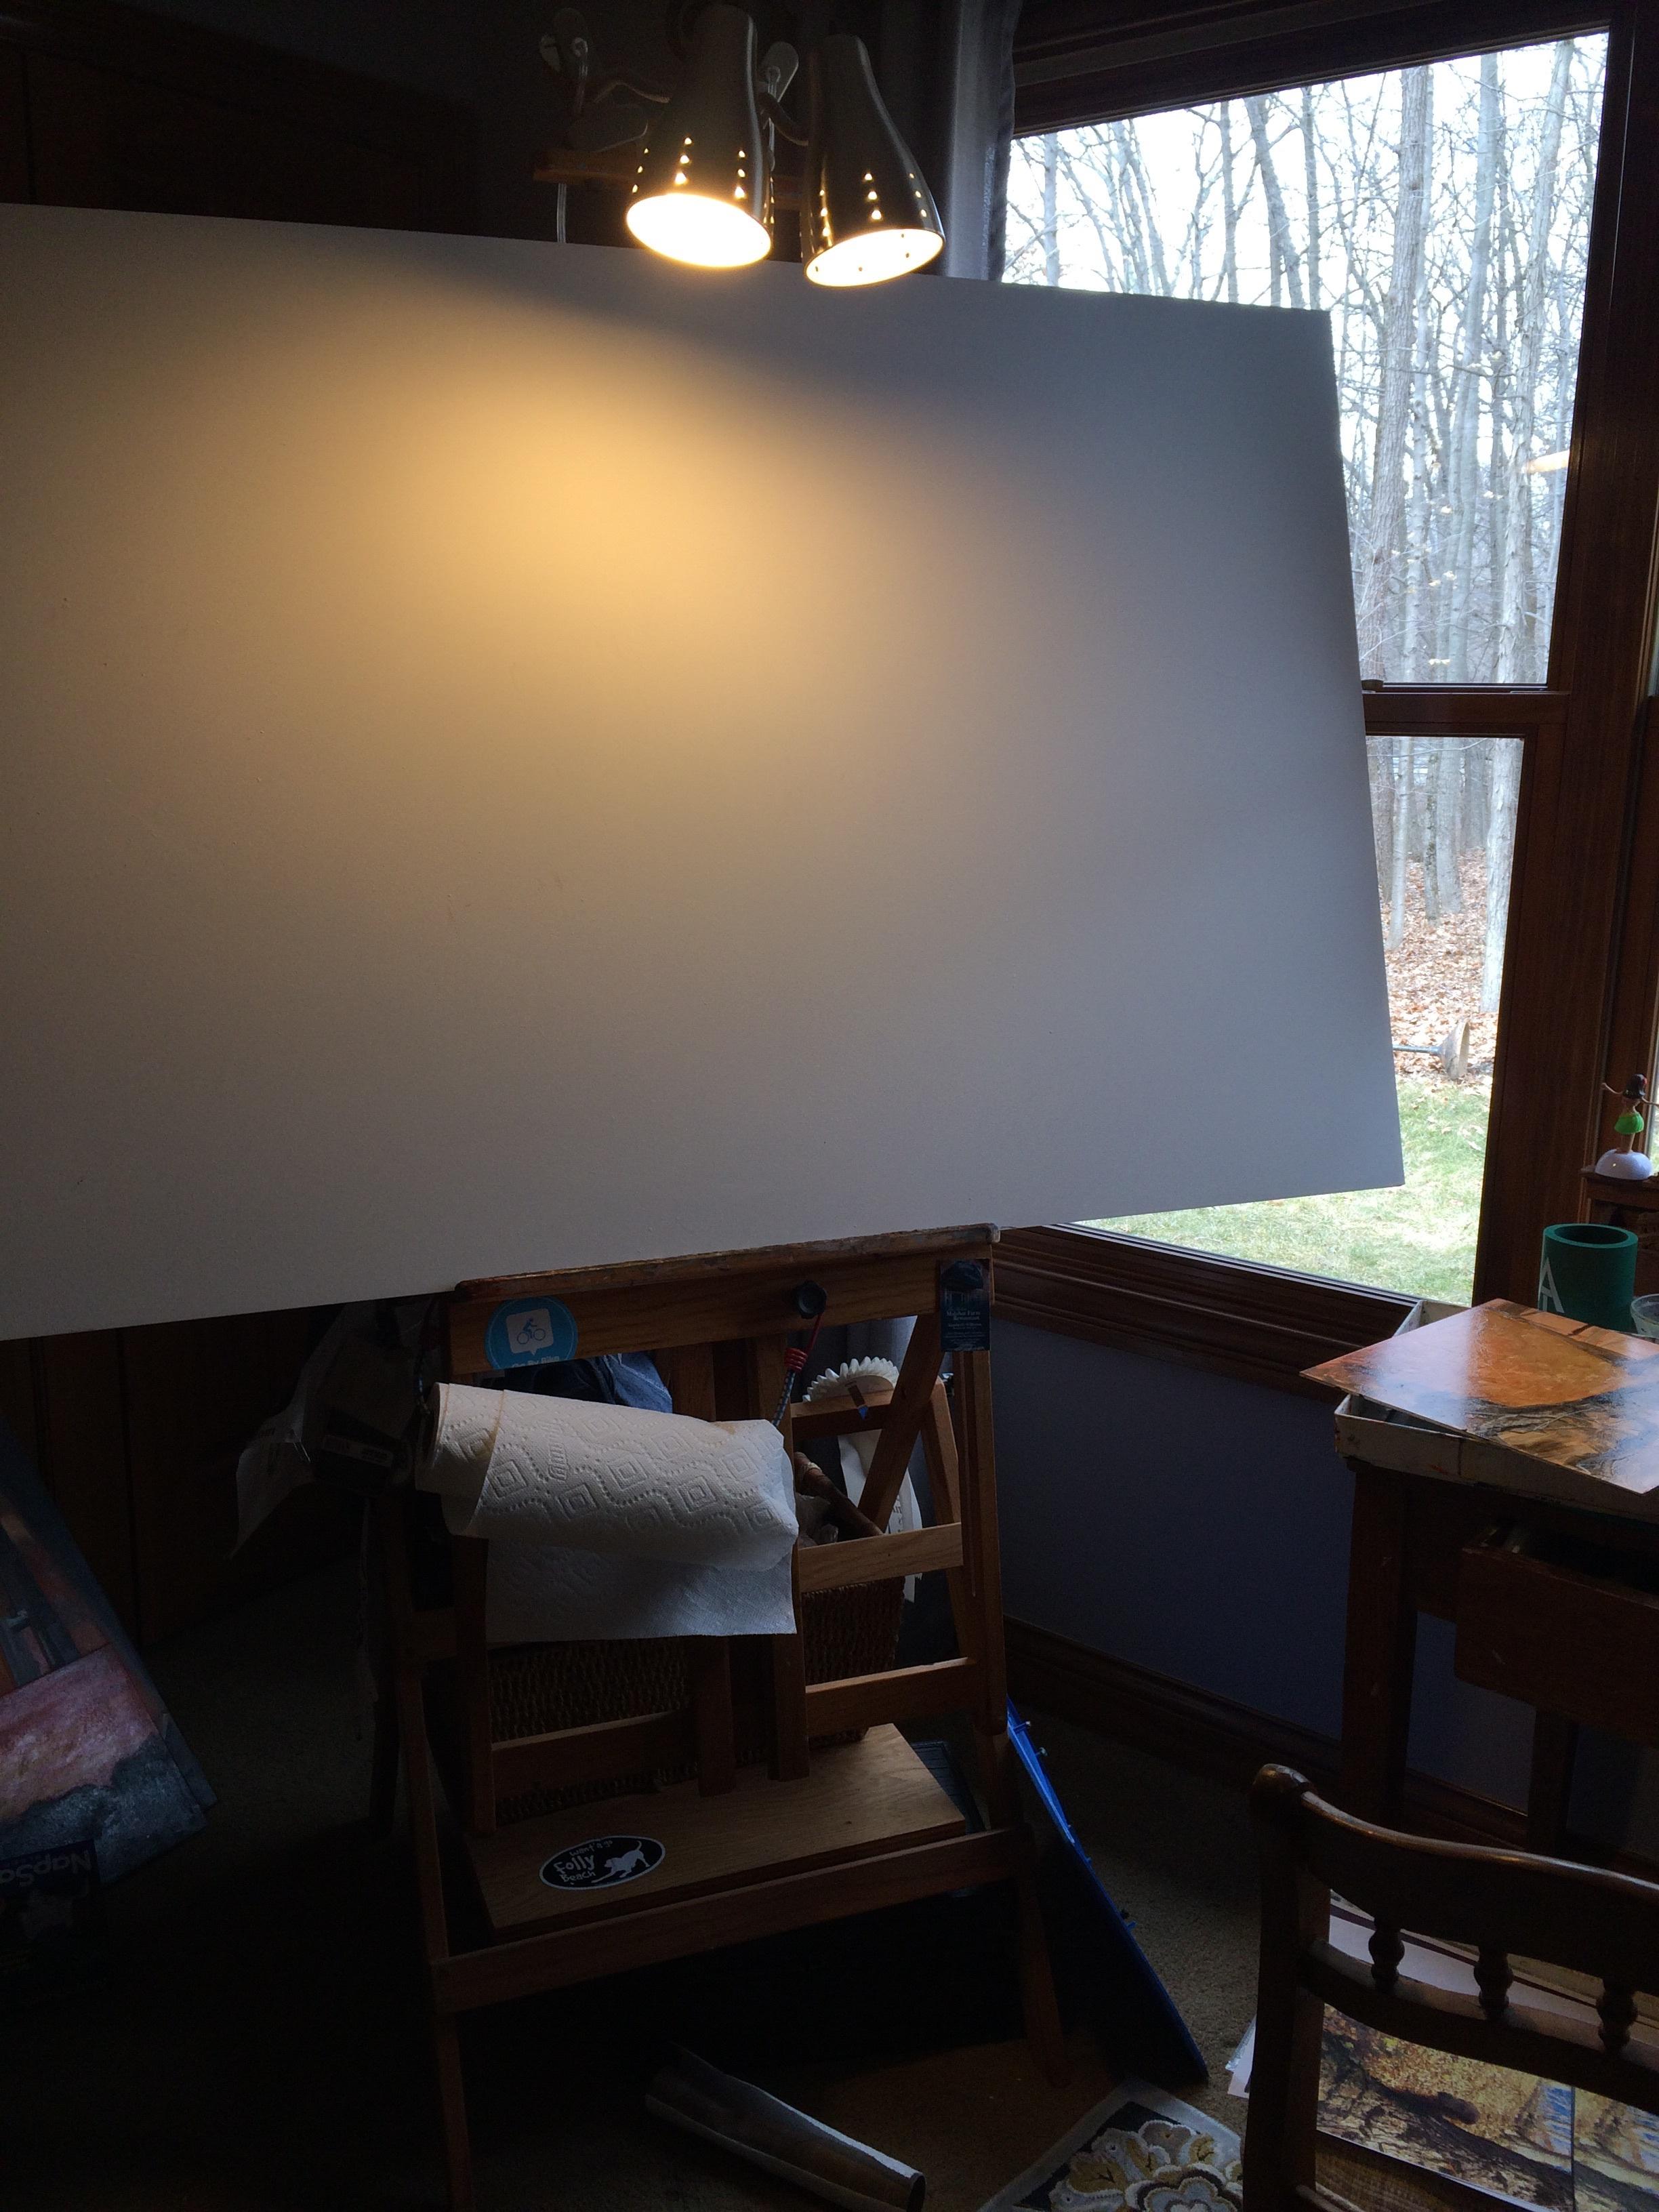 I'm not afraid of a blank canvas.